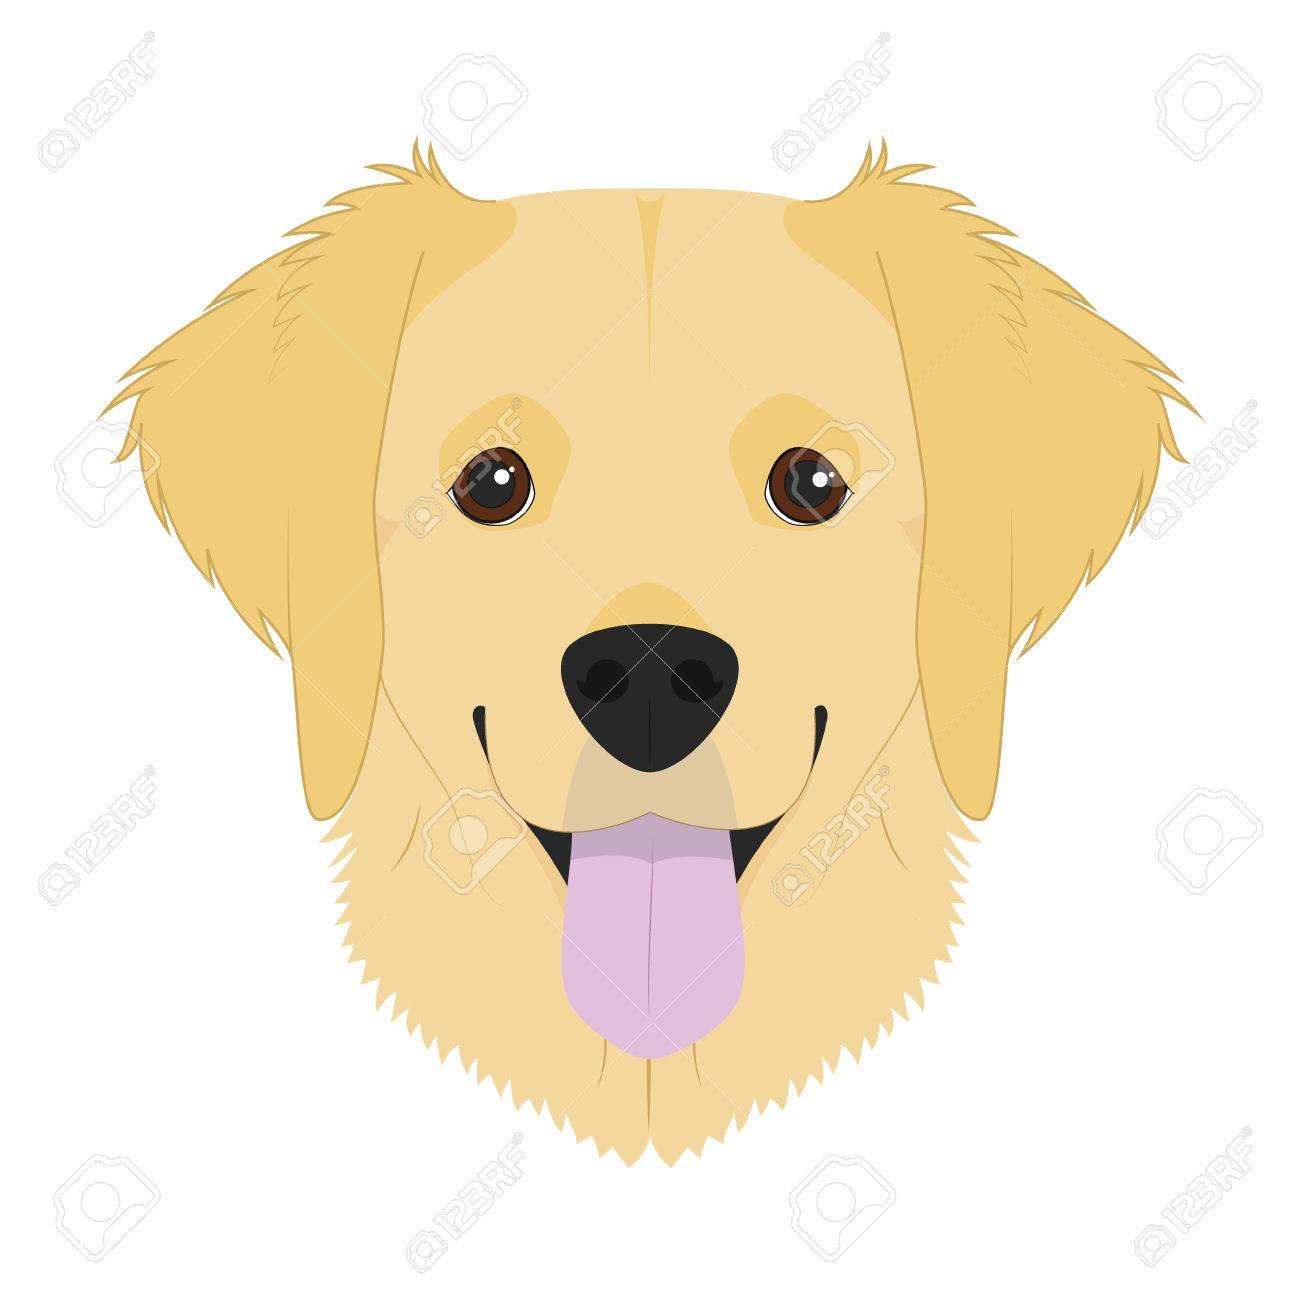 Golden Retriever dog isolated on white background vector.